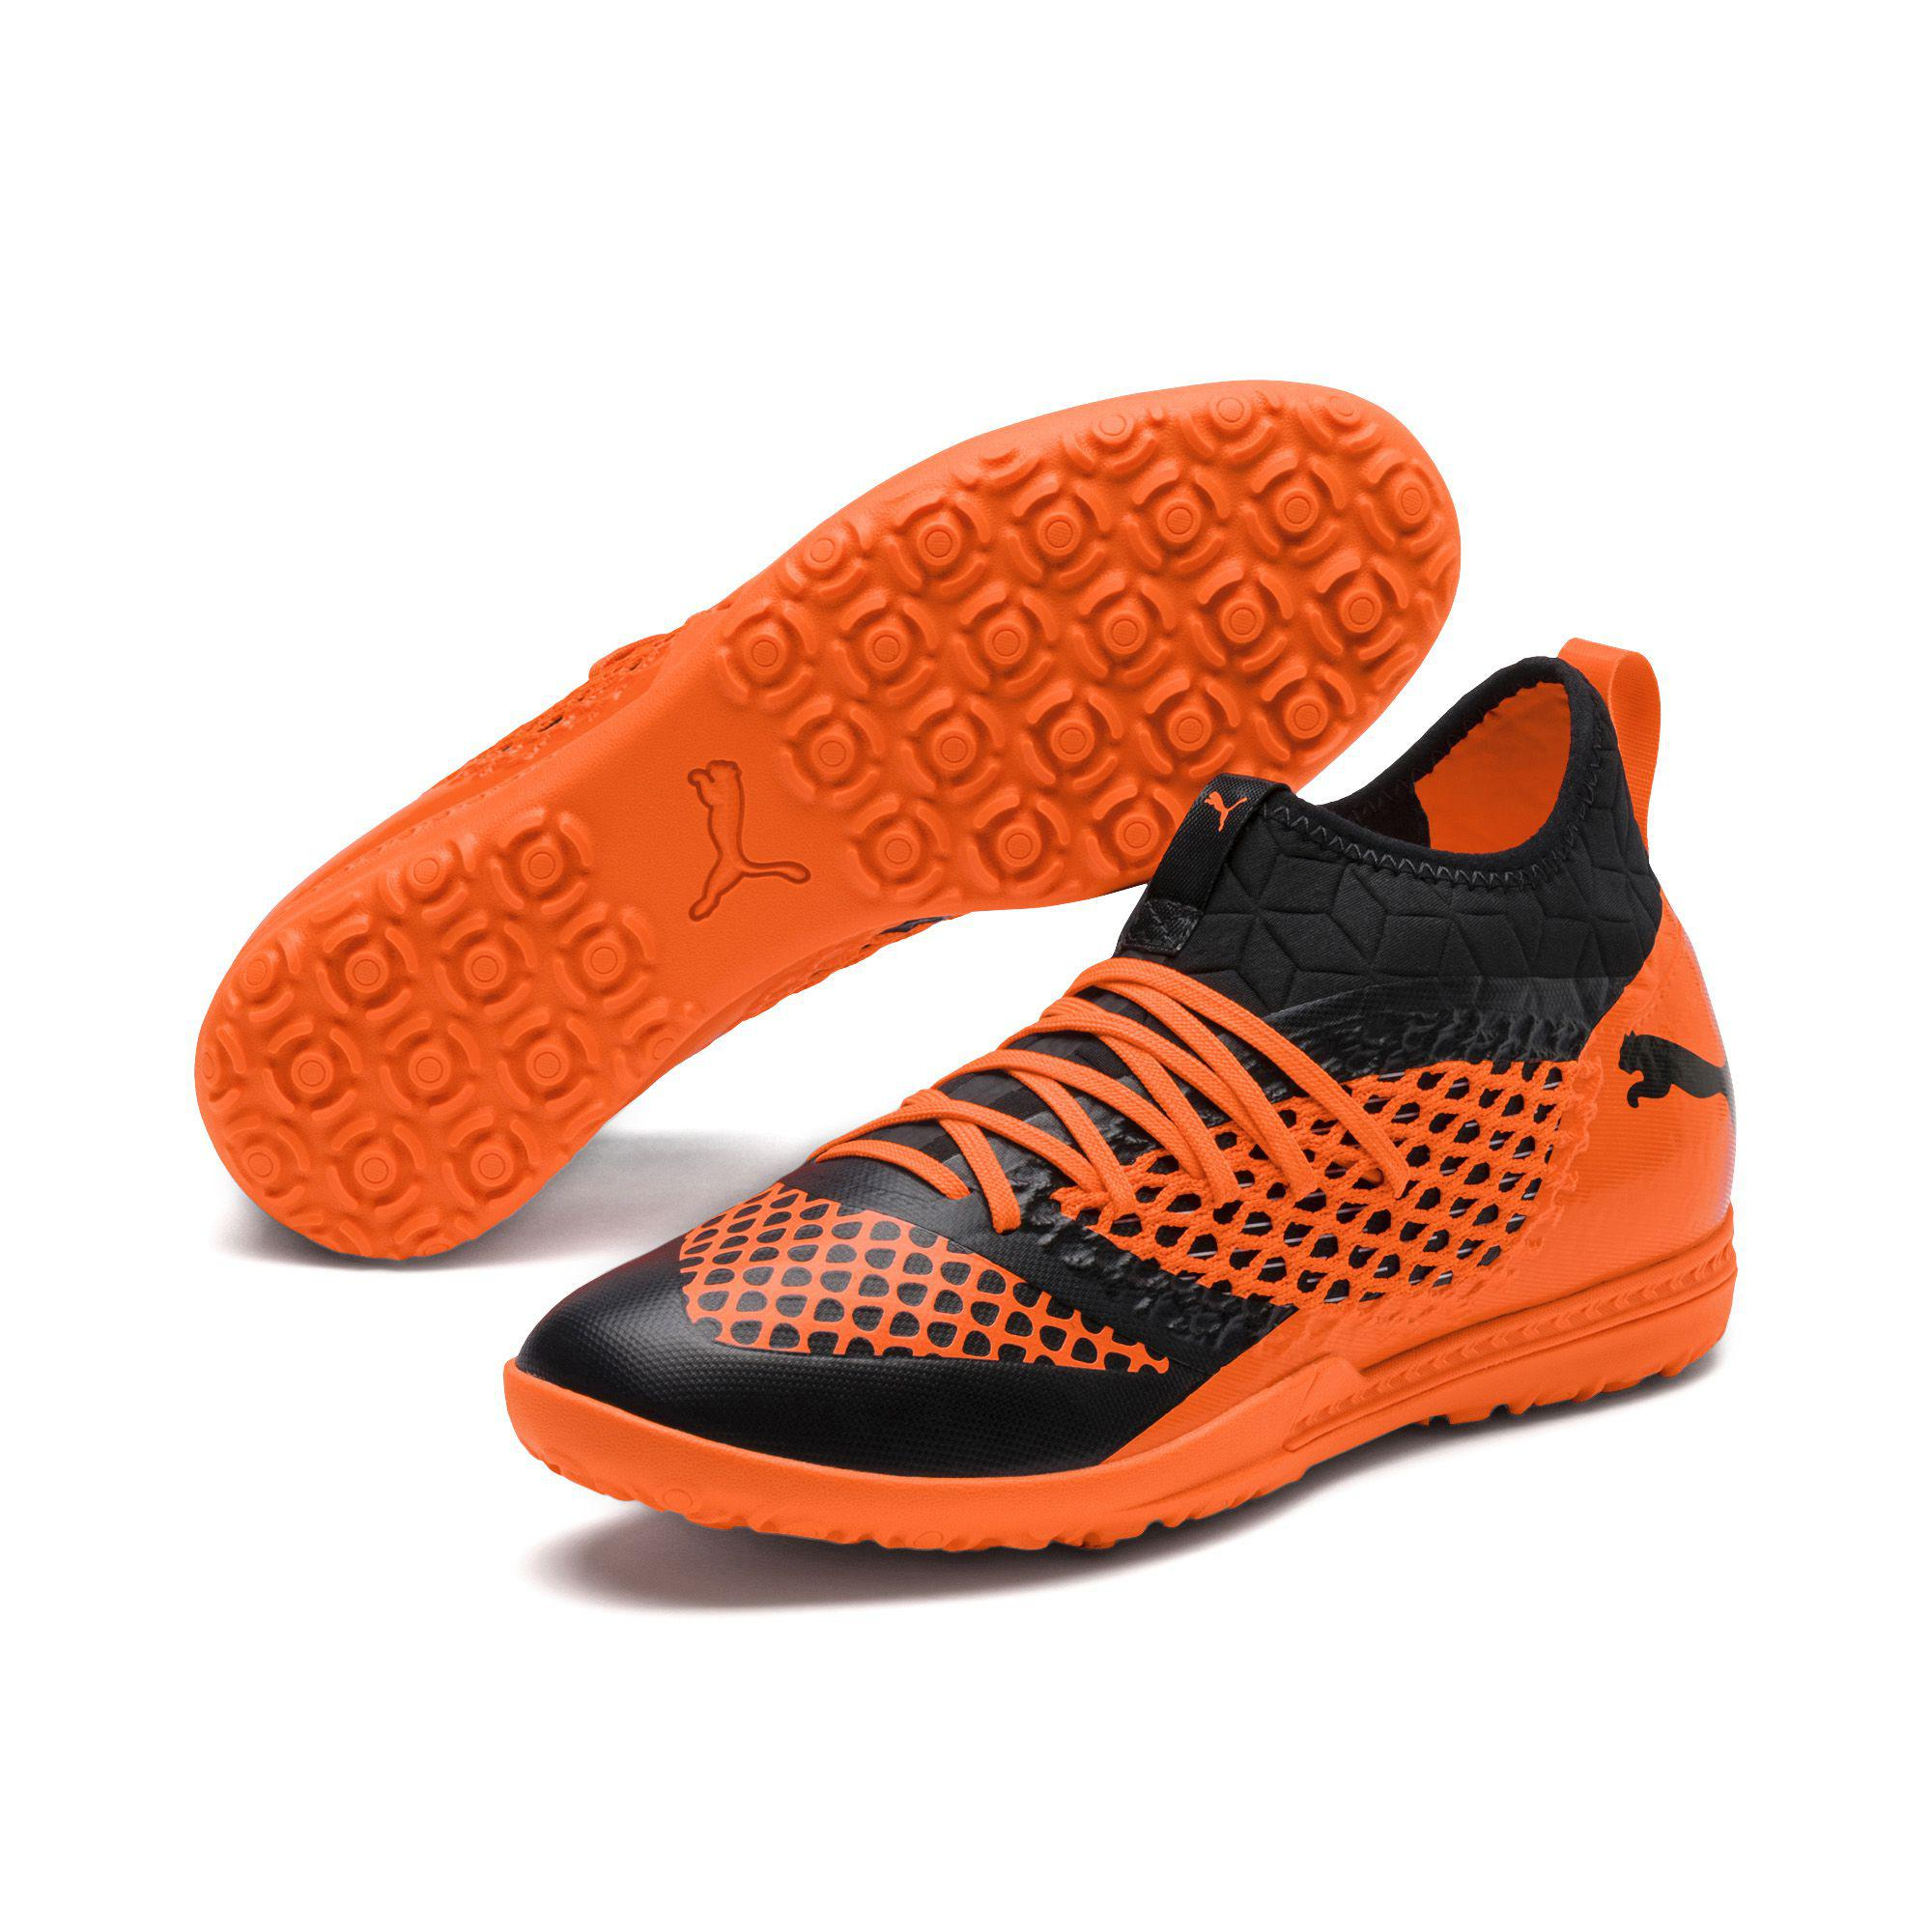 6f90952e3783e9 ... clearance puma orange future 2.3 netfit tt for men lyst. view  fullscreen 99868 a4d5f